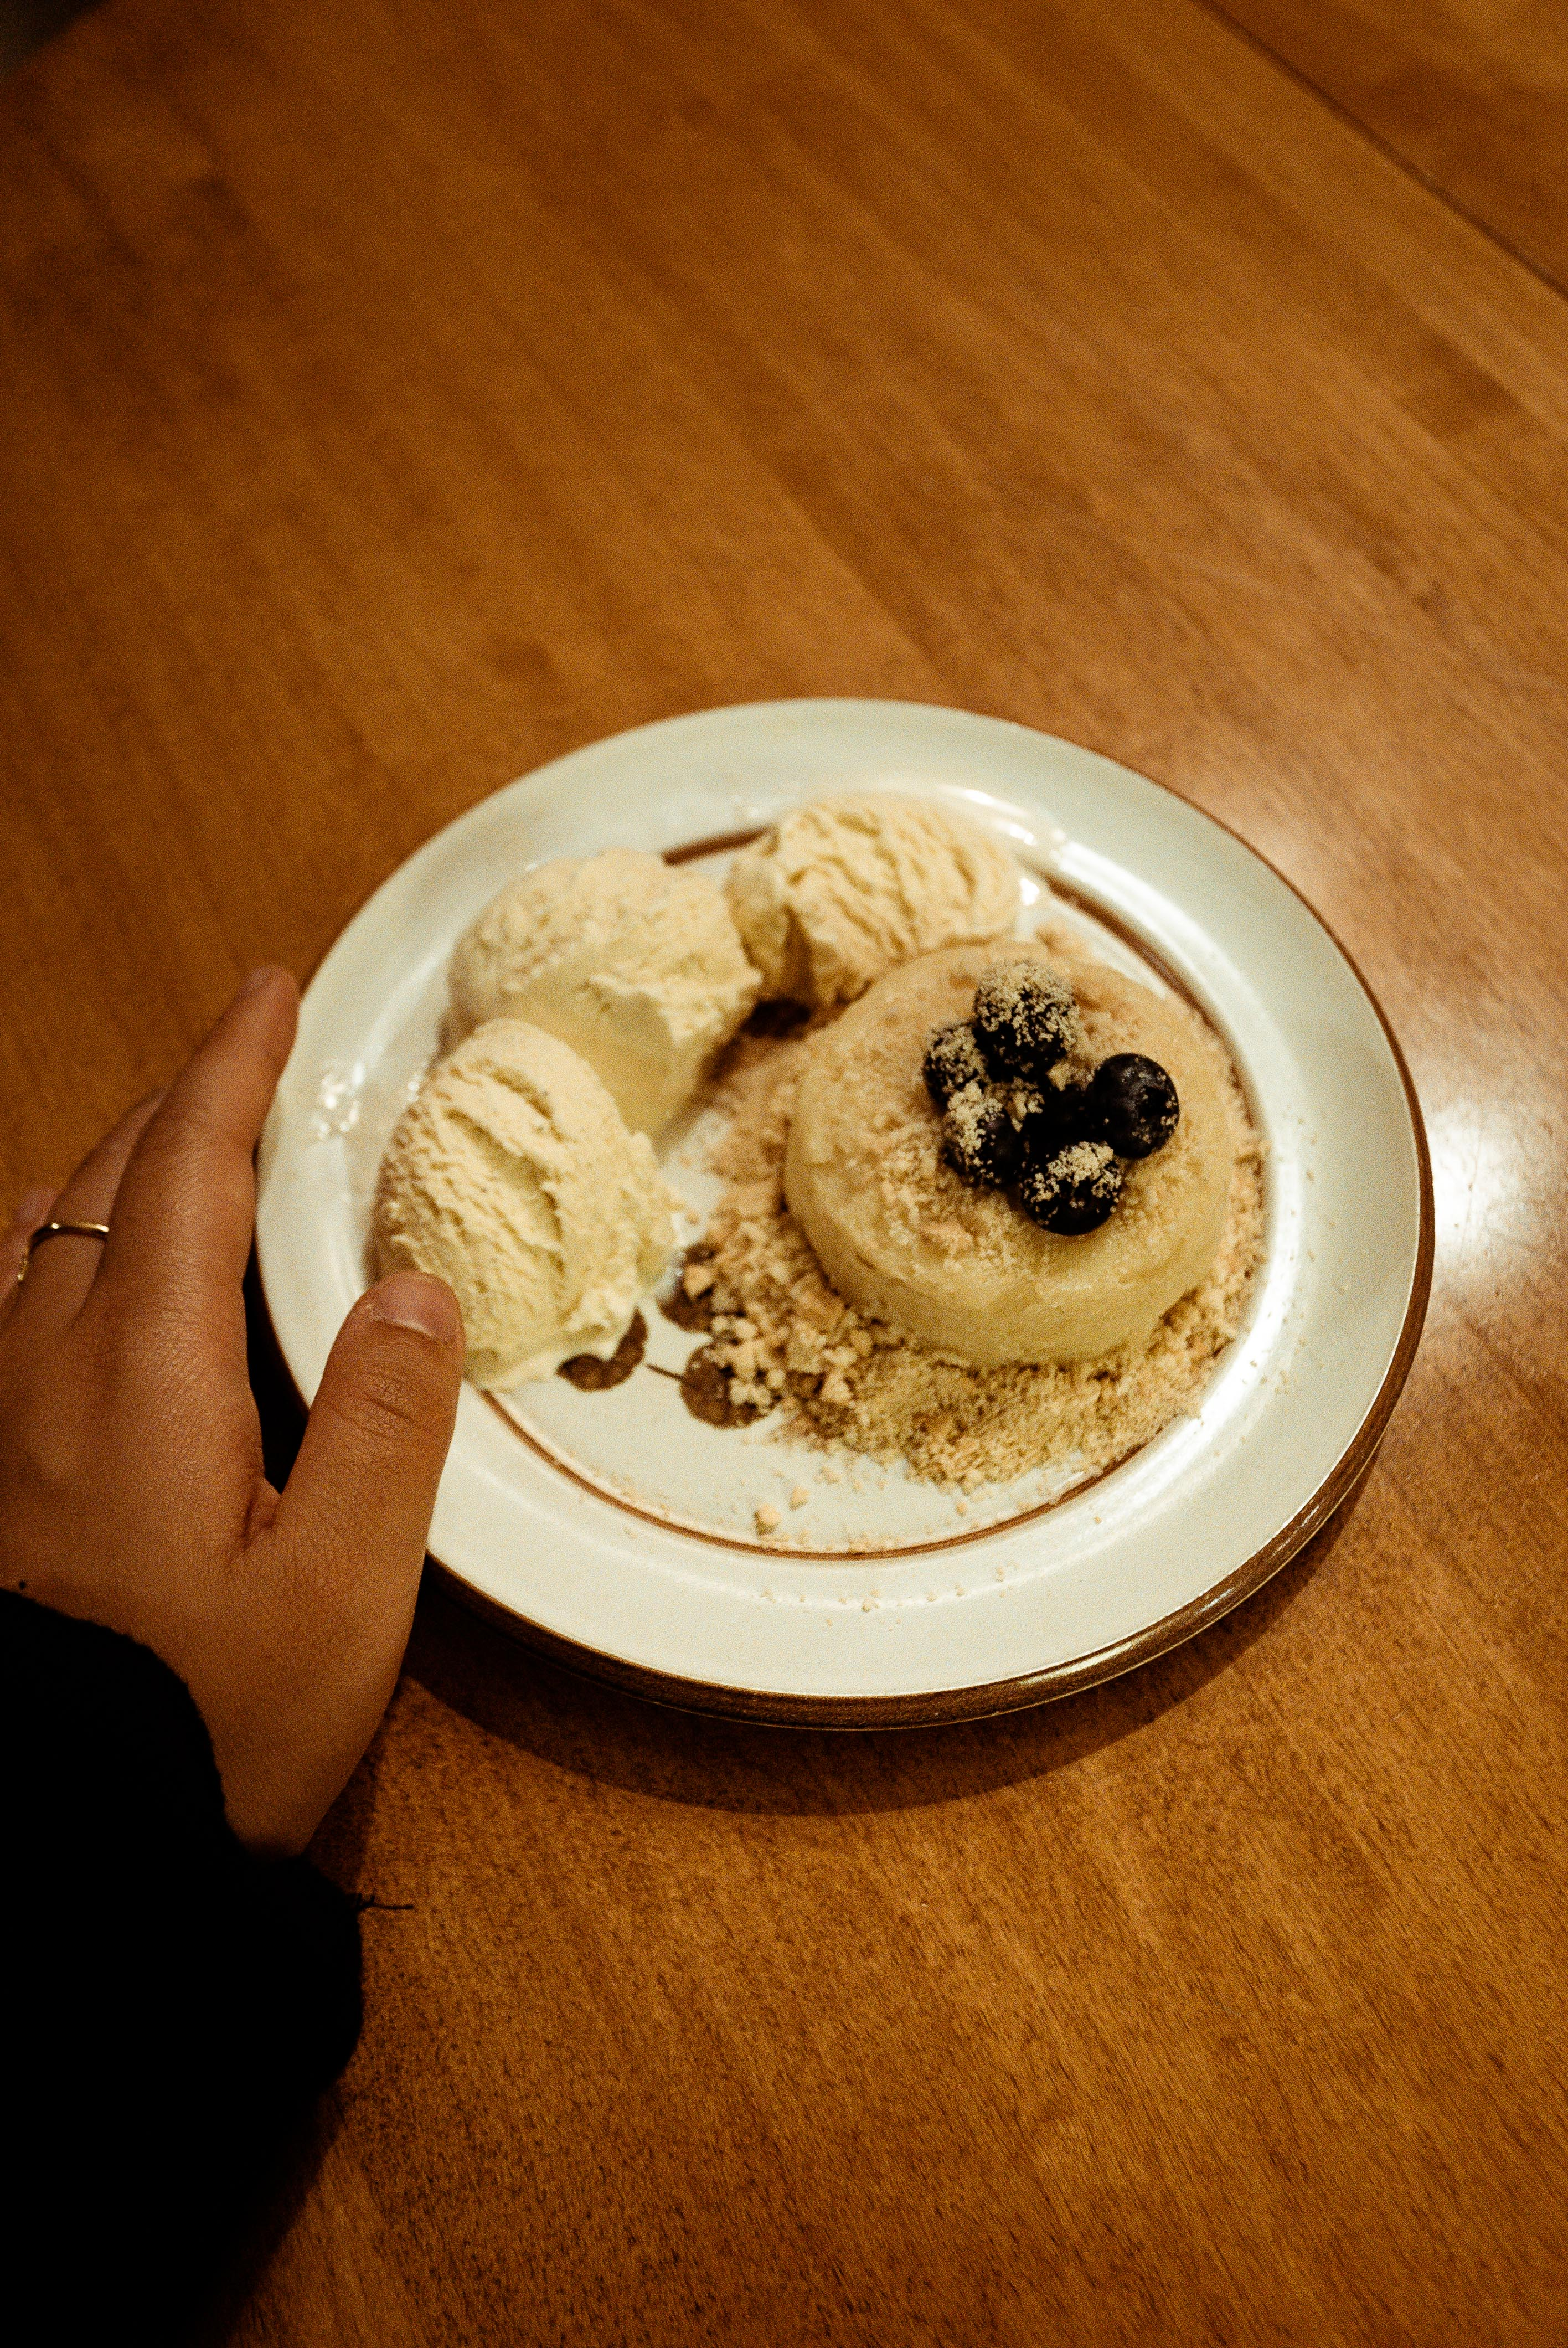 Ice Cream Served on White Plate